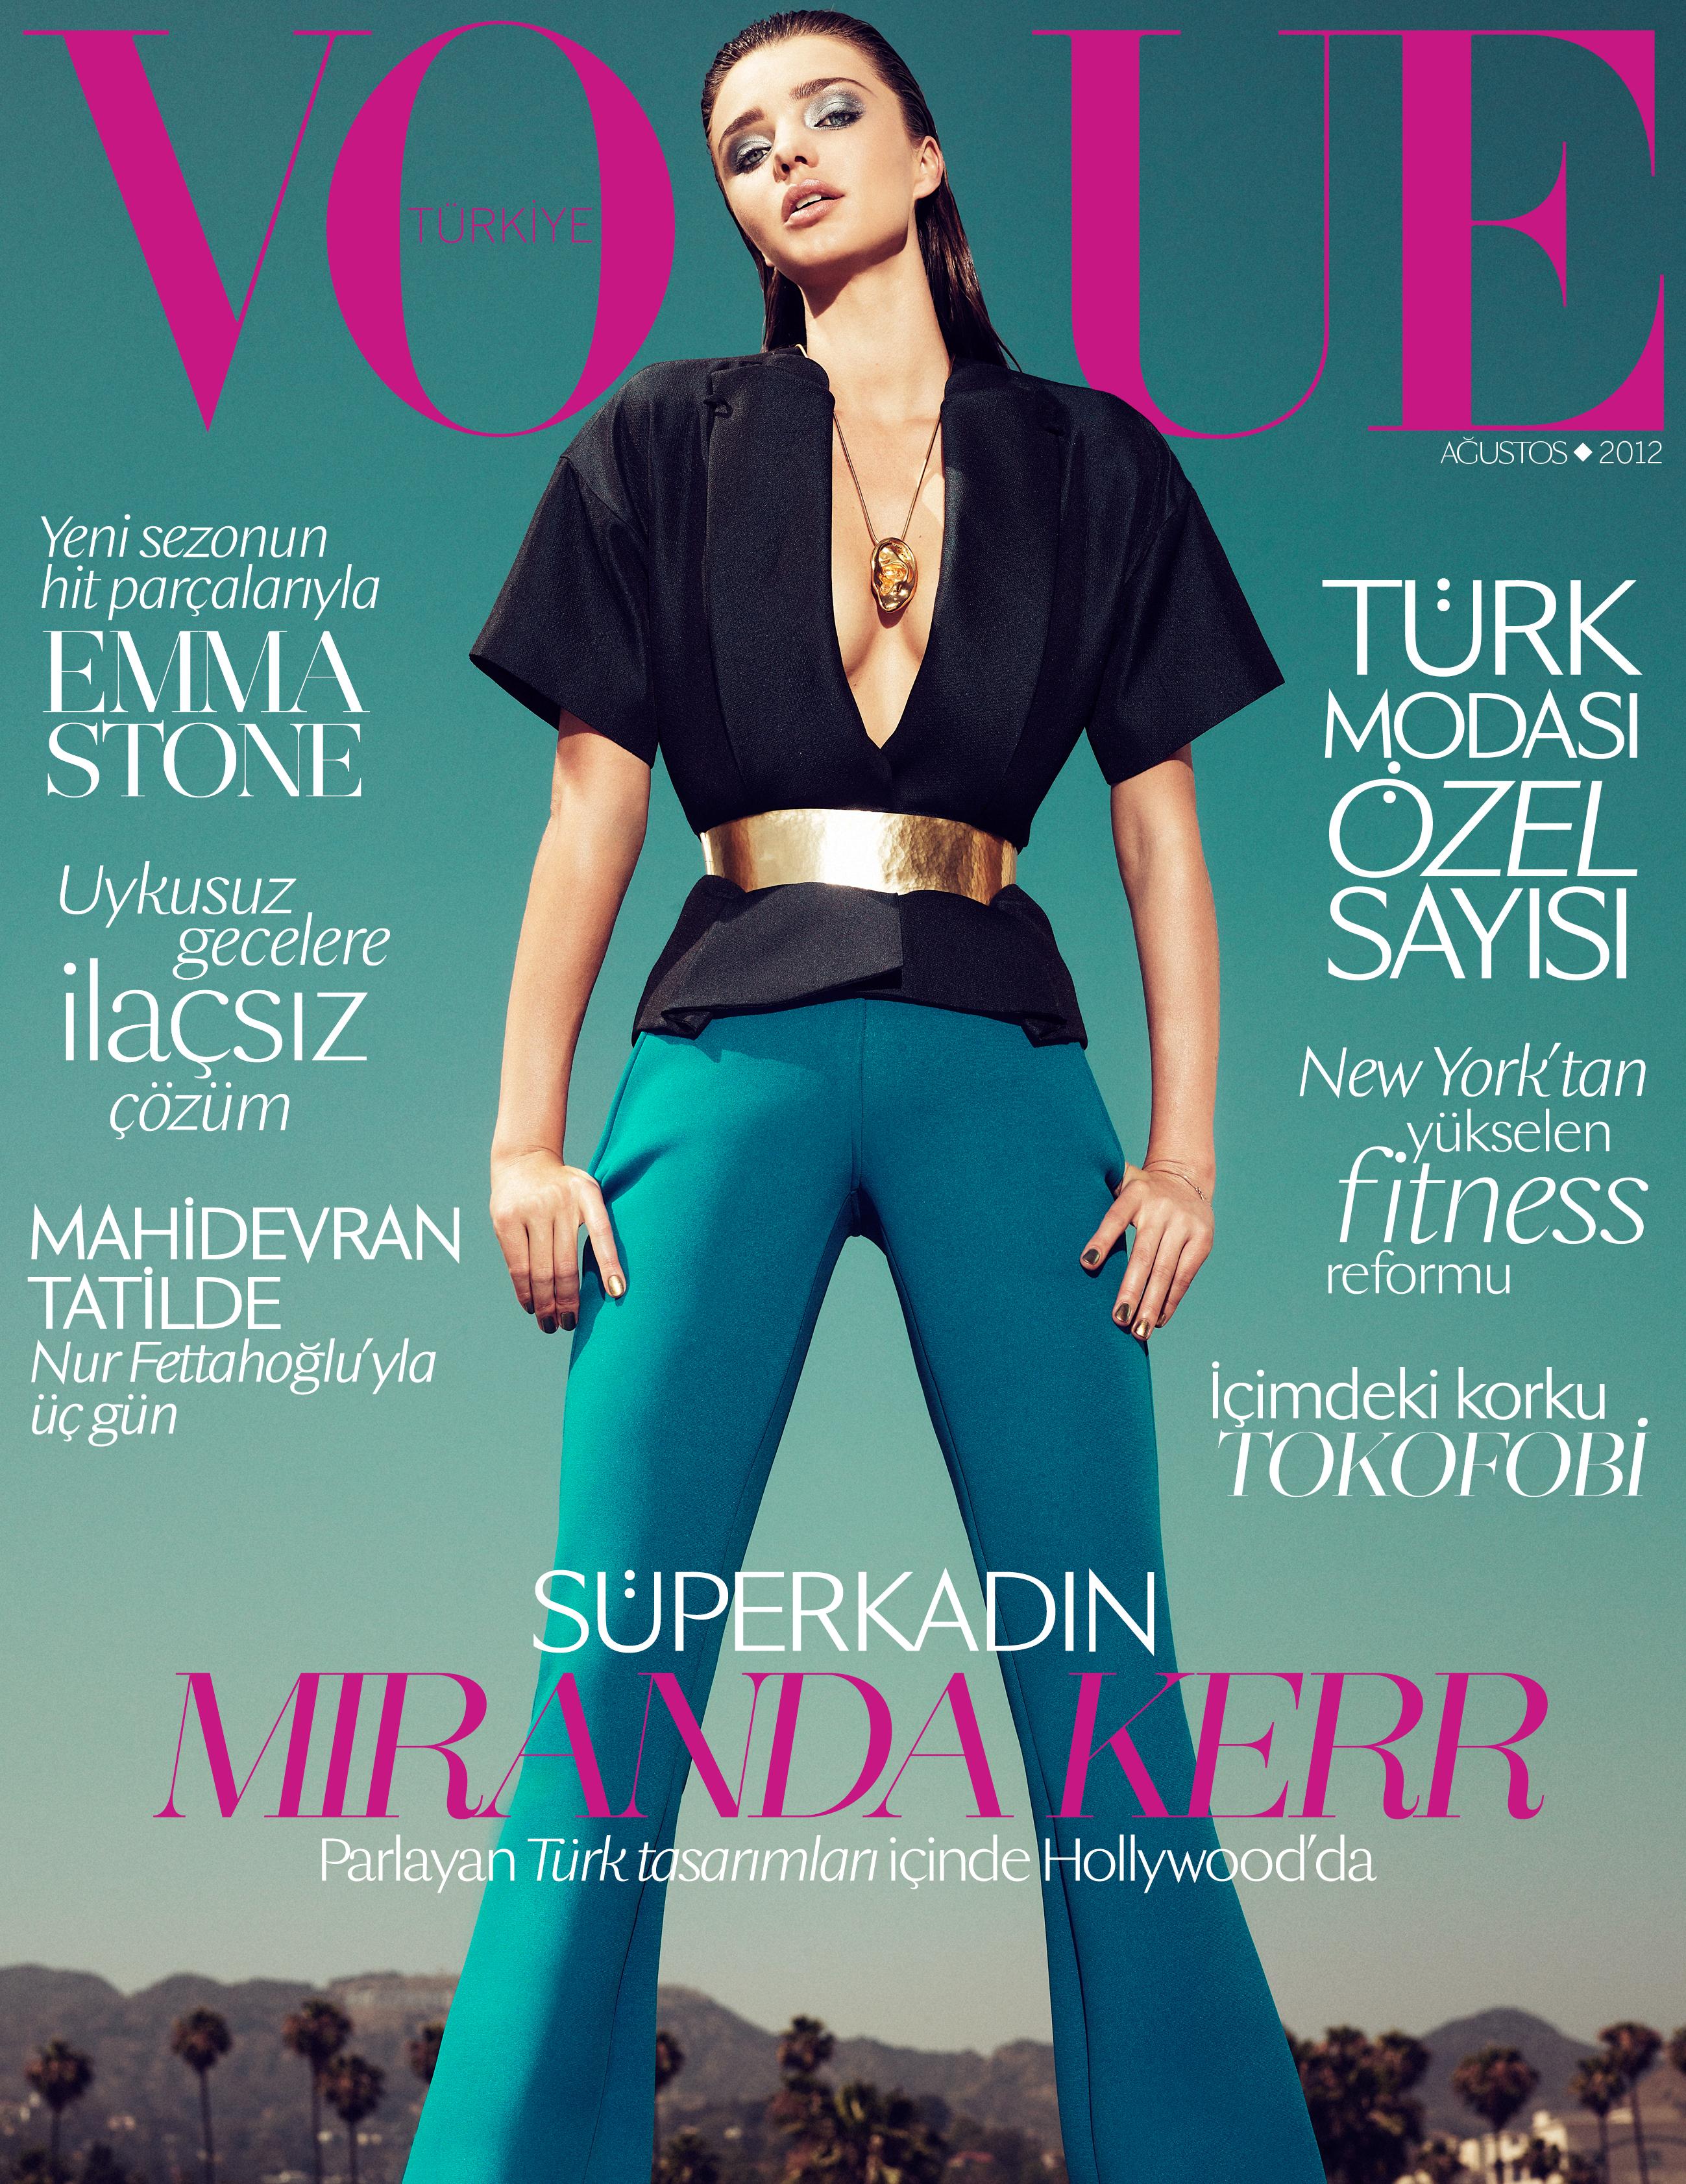 Miranda Kerr - Page 1511 - Female Fashion Models - Bellazon Miranda Kerr Bellazon